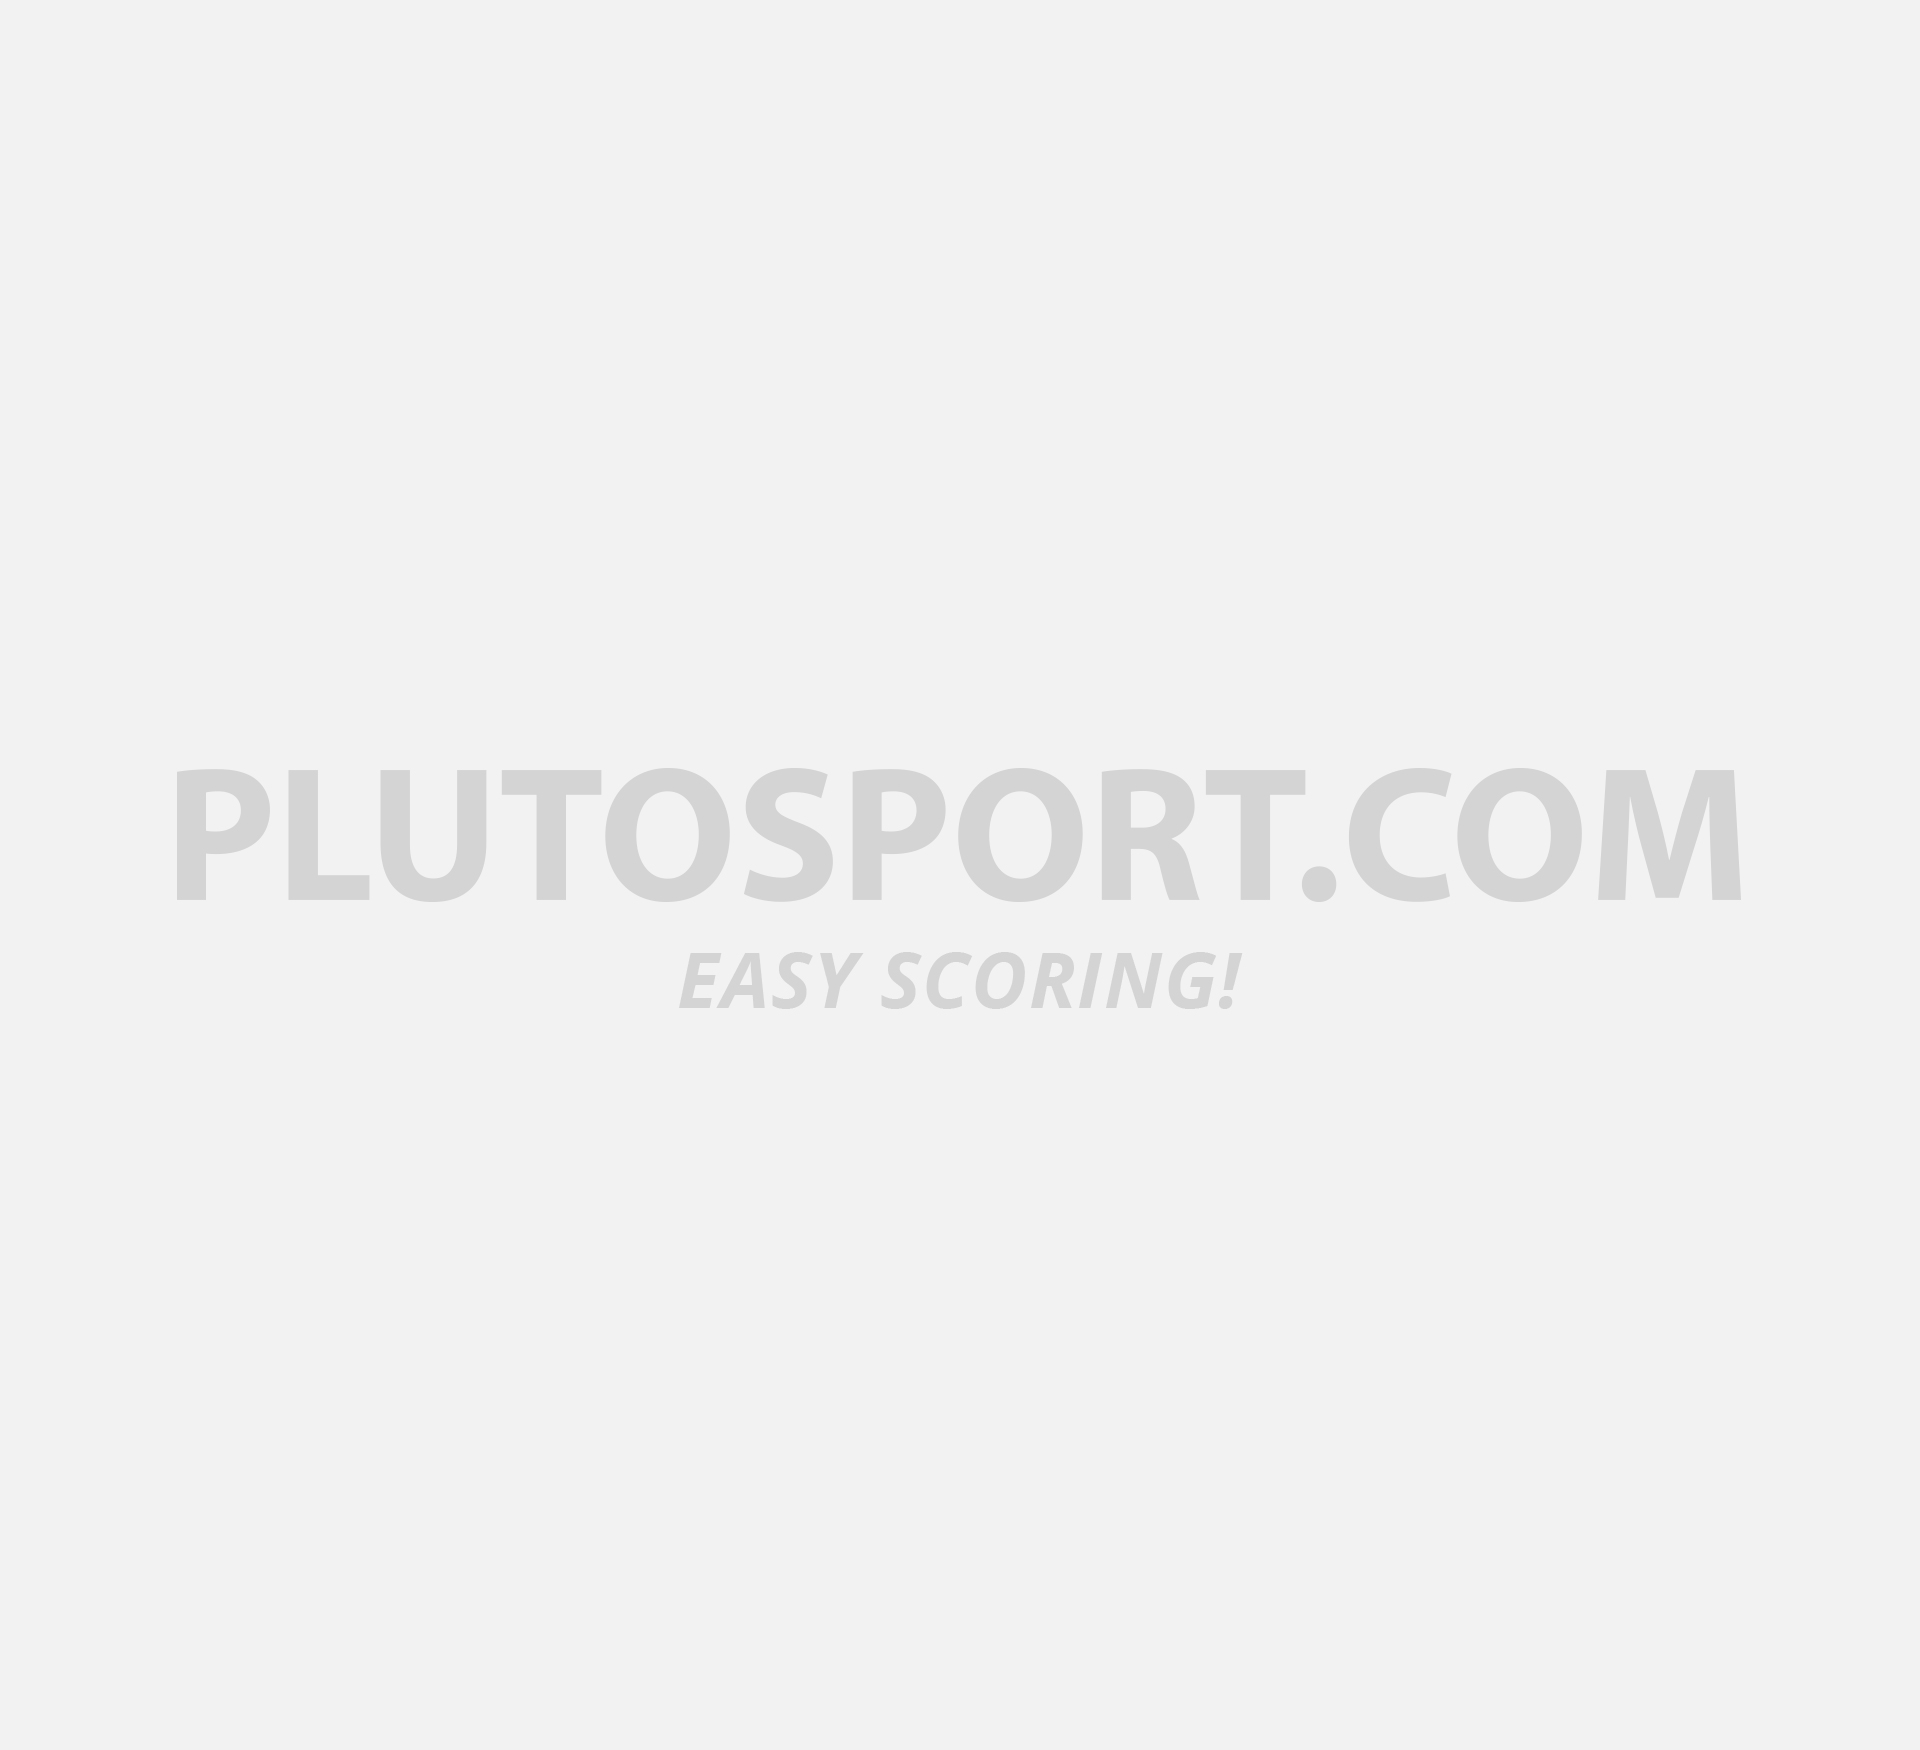 39aa0d95b63 Nike Vapor Court Tennis Shoes Women - Gravel - Shoes - Tennis - Sports |  Plutosport